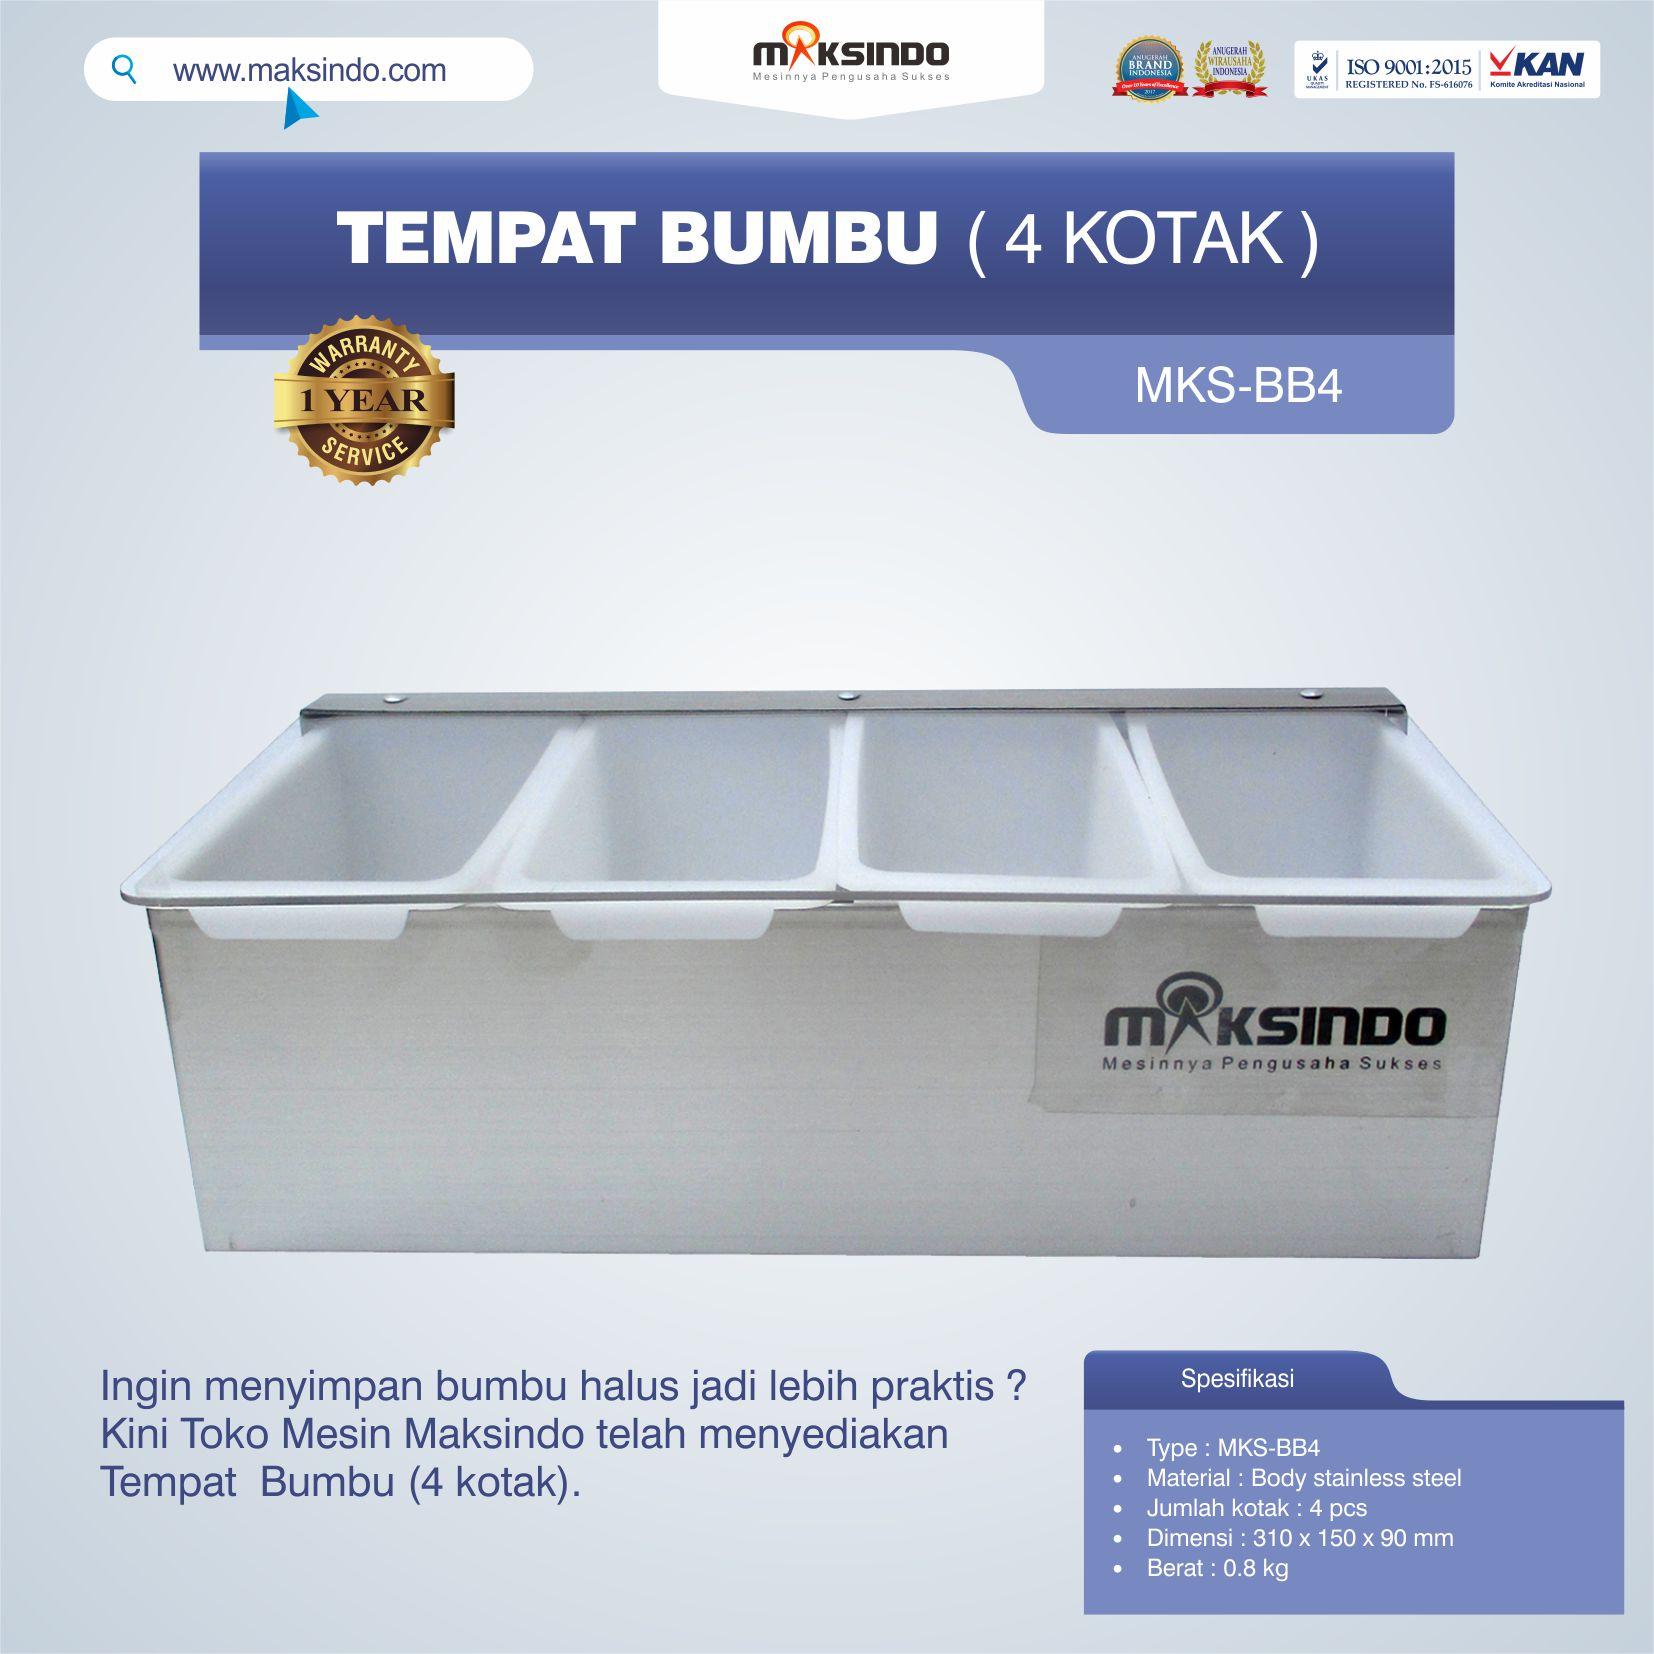 Jual Tempat Bumbu (4 kotak) di Jakarta